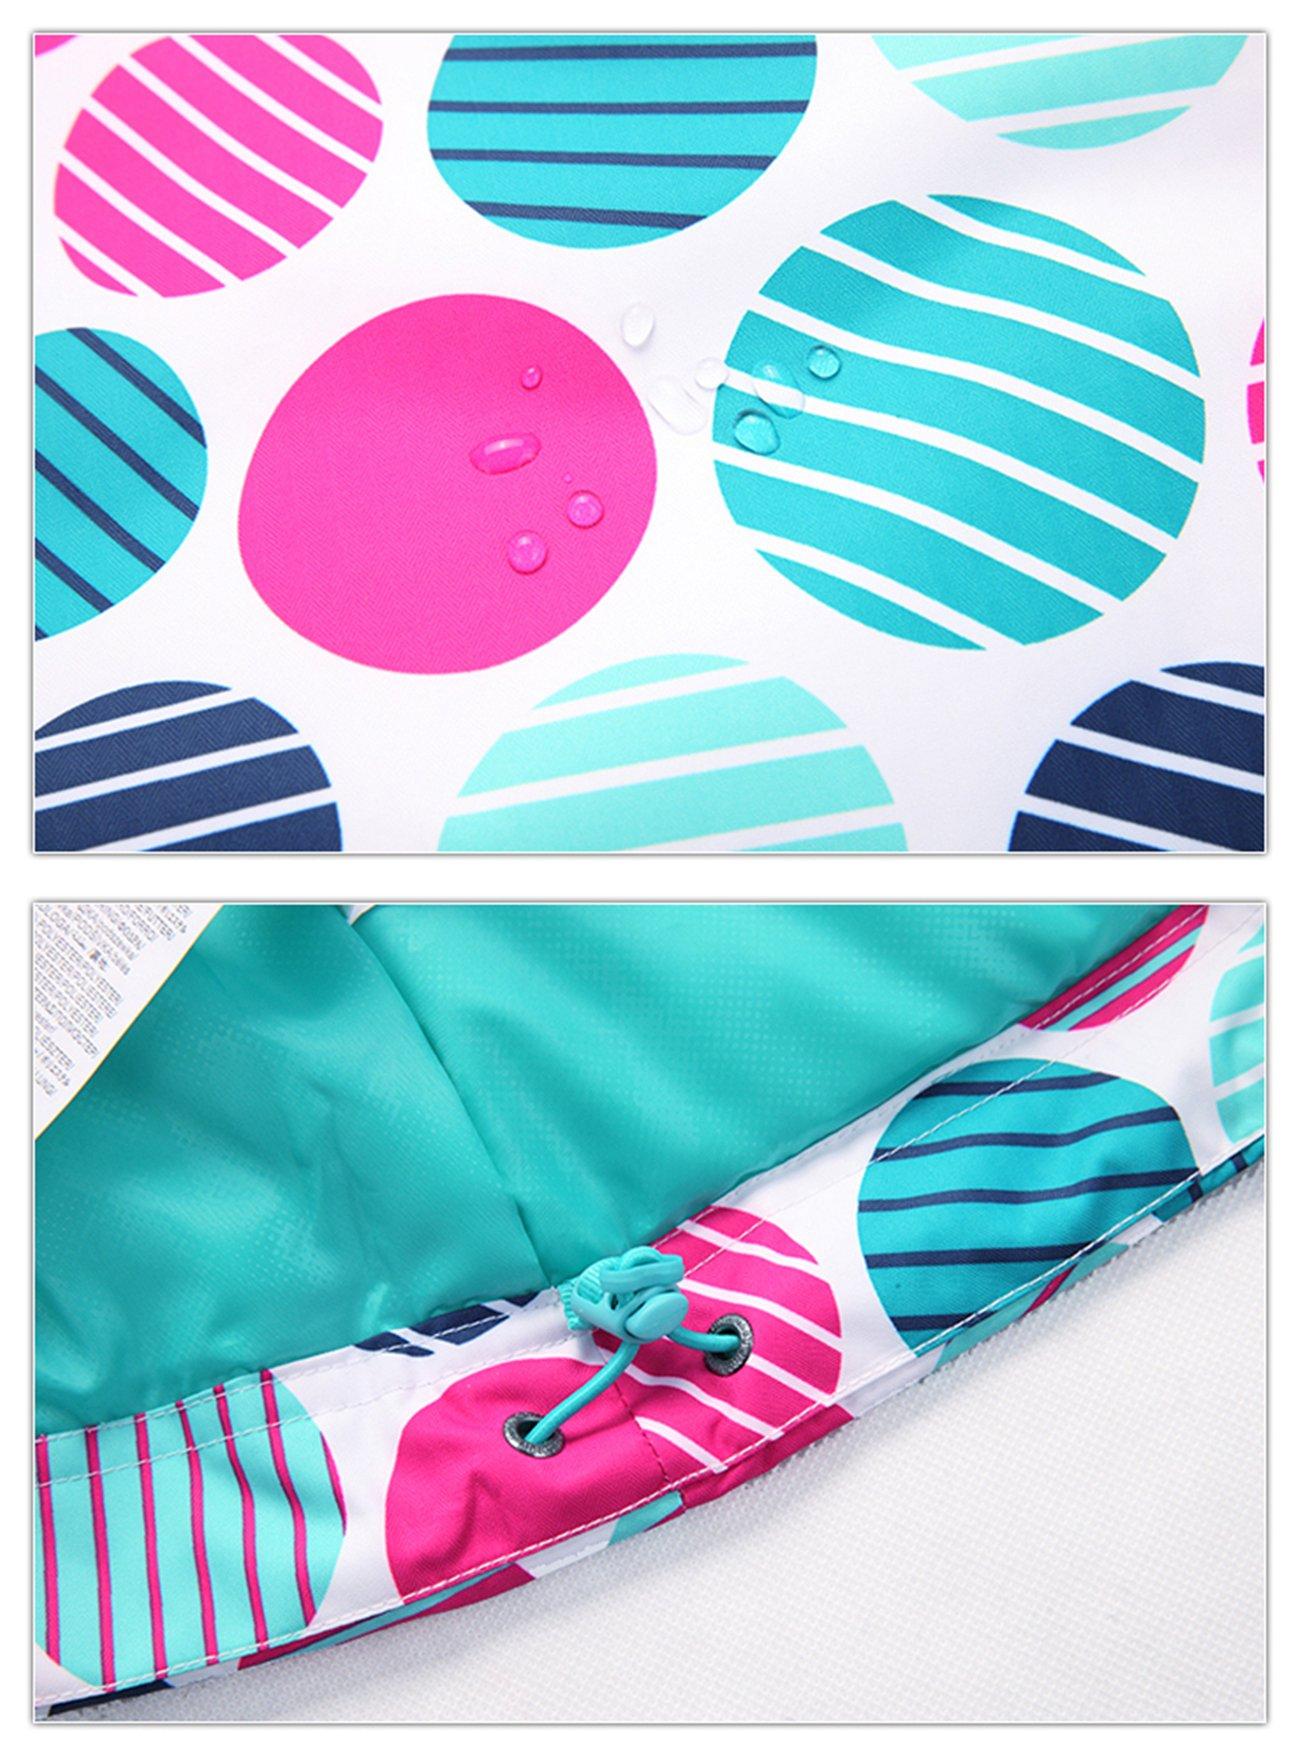 APTRO Women's High Windproof Technology Colorfull Printed Ski Jacket Style #37 Size S by APTRO (Image #5)